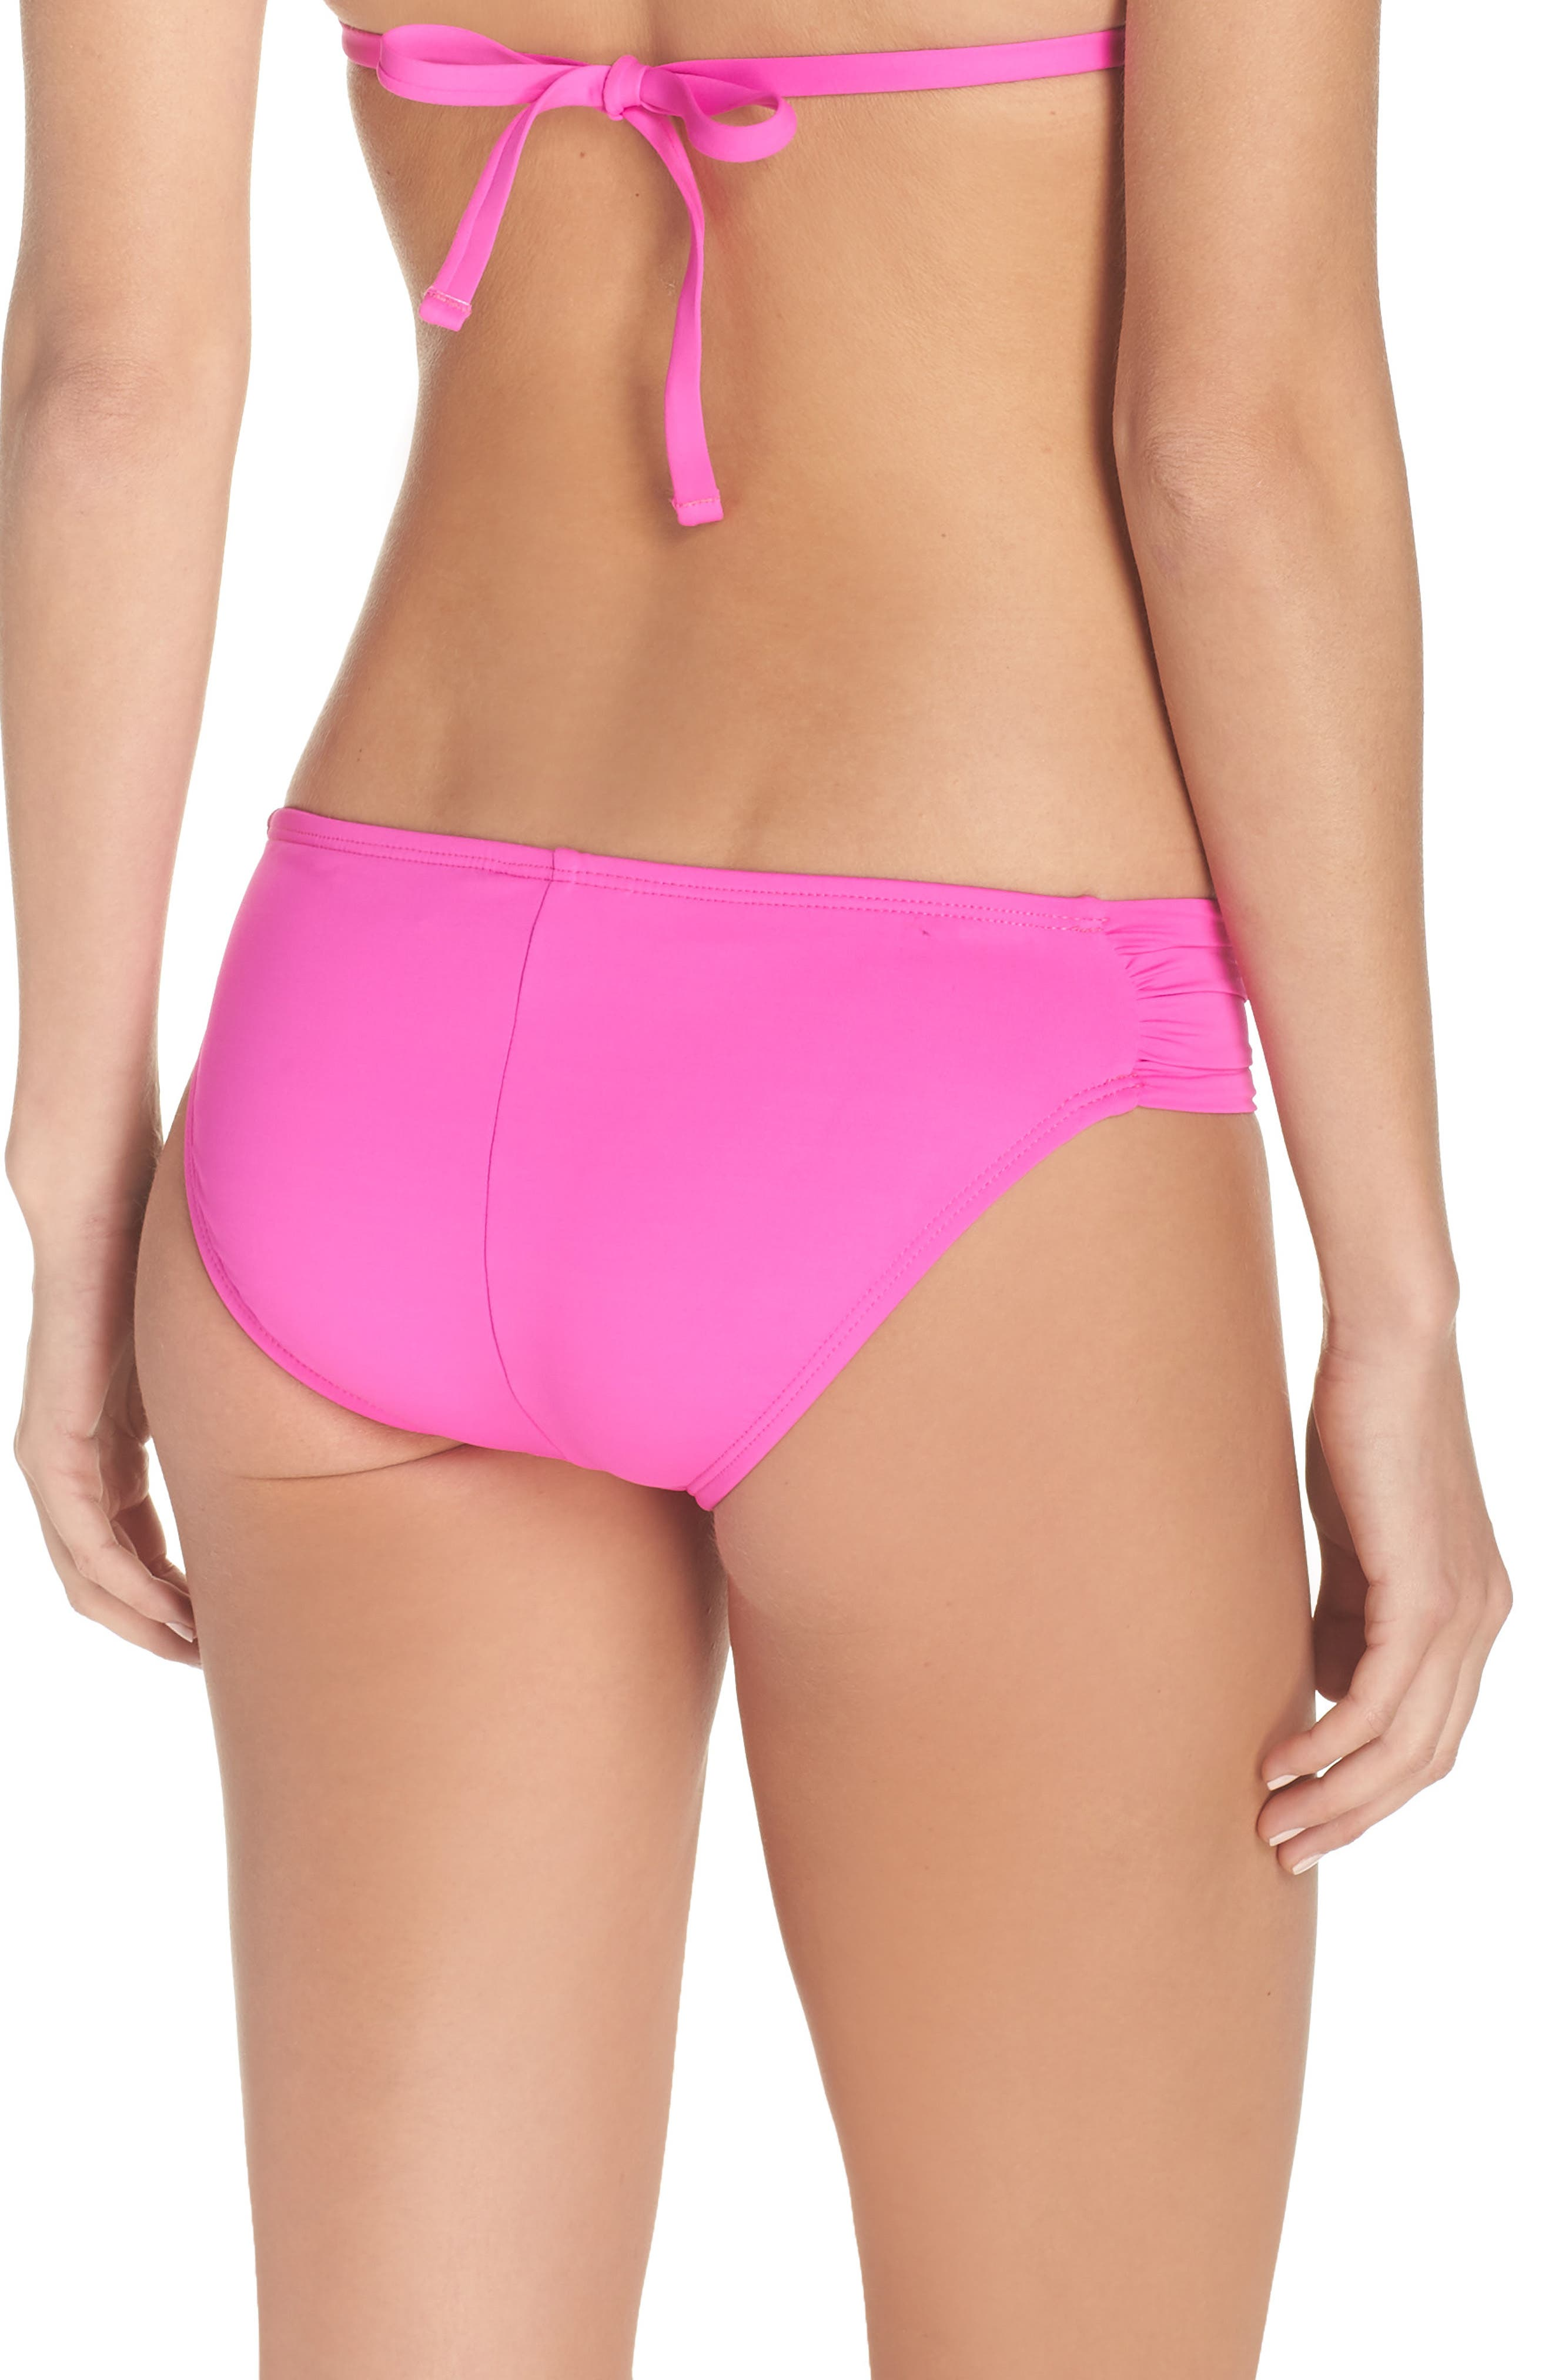 Island Blanca Halter Bikini Top,                             Alternate thumbnail 2, color,                             ELECTRIC PINK